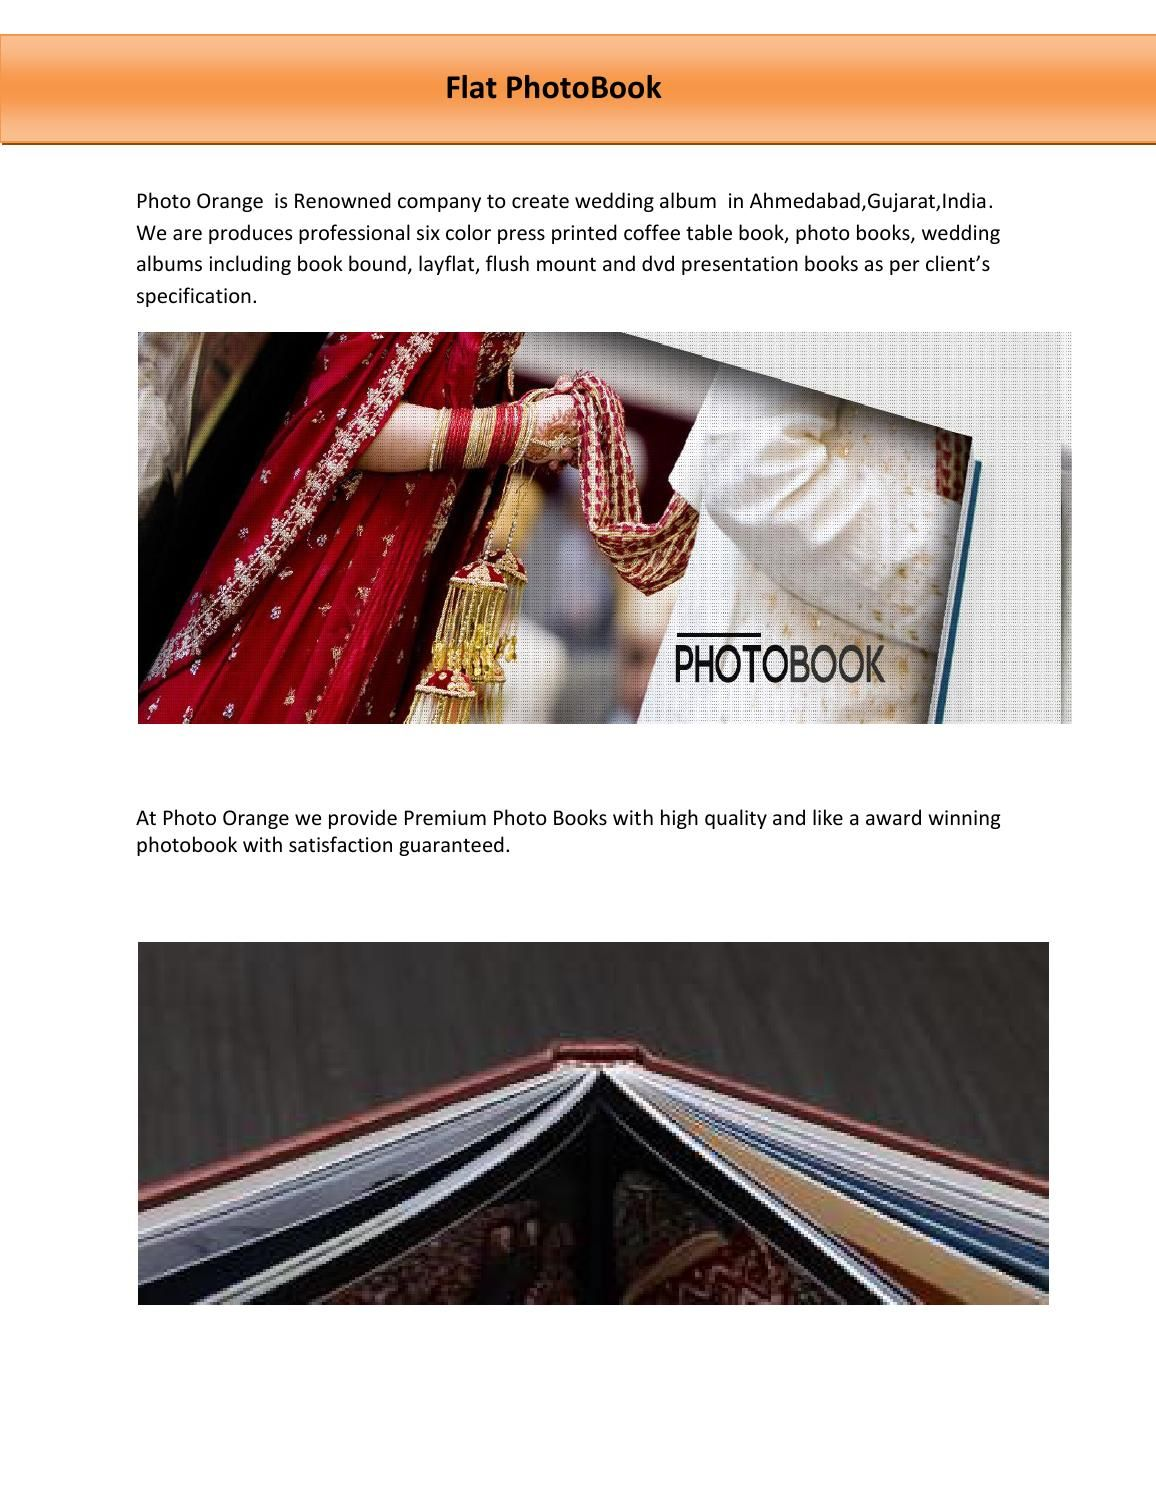 Flat Photobook Pinterest - Coffee table book printing india